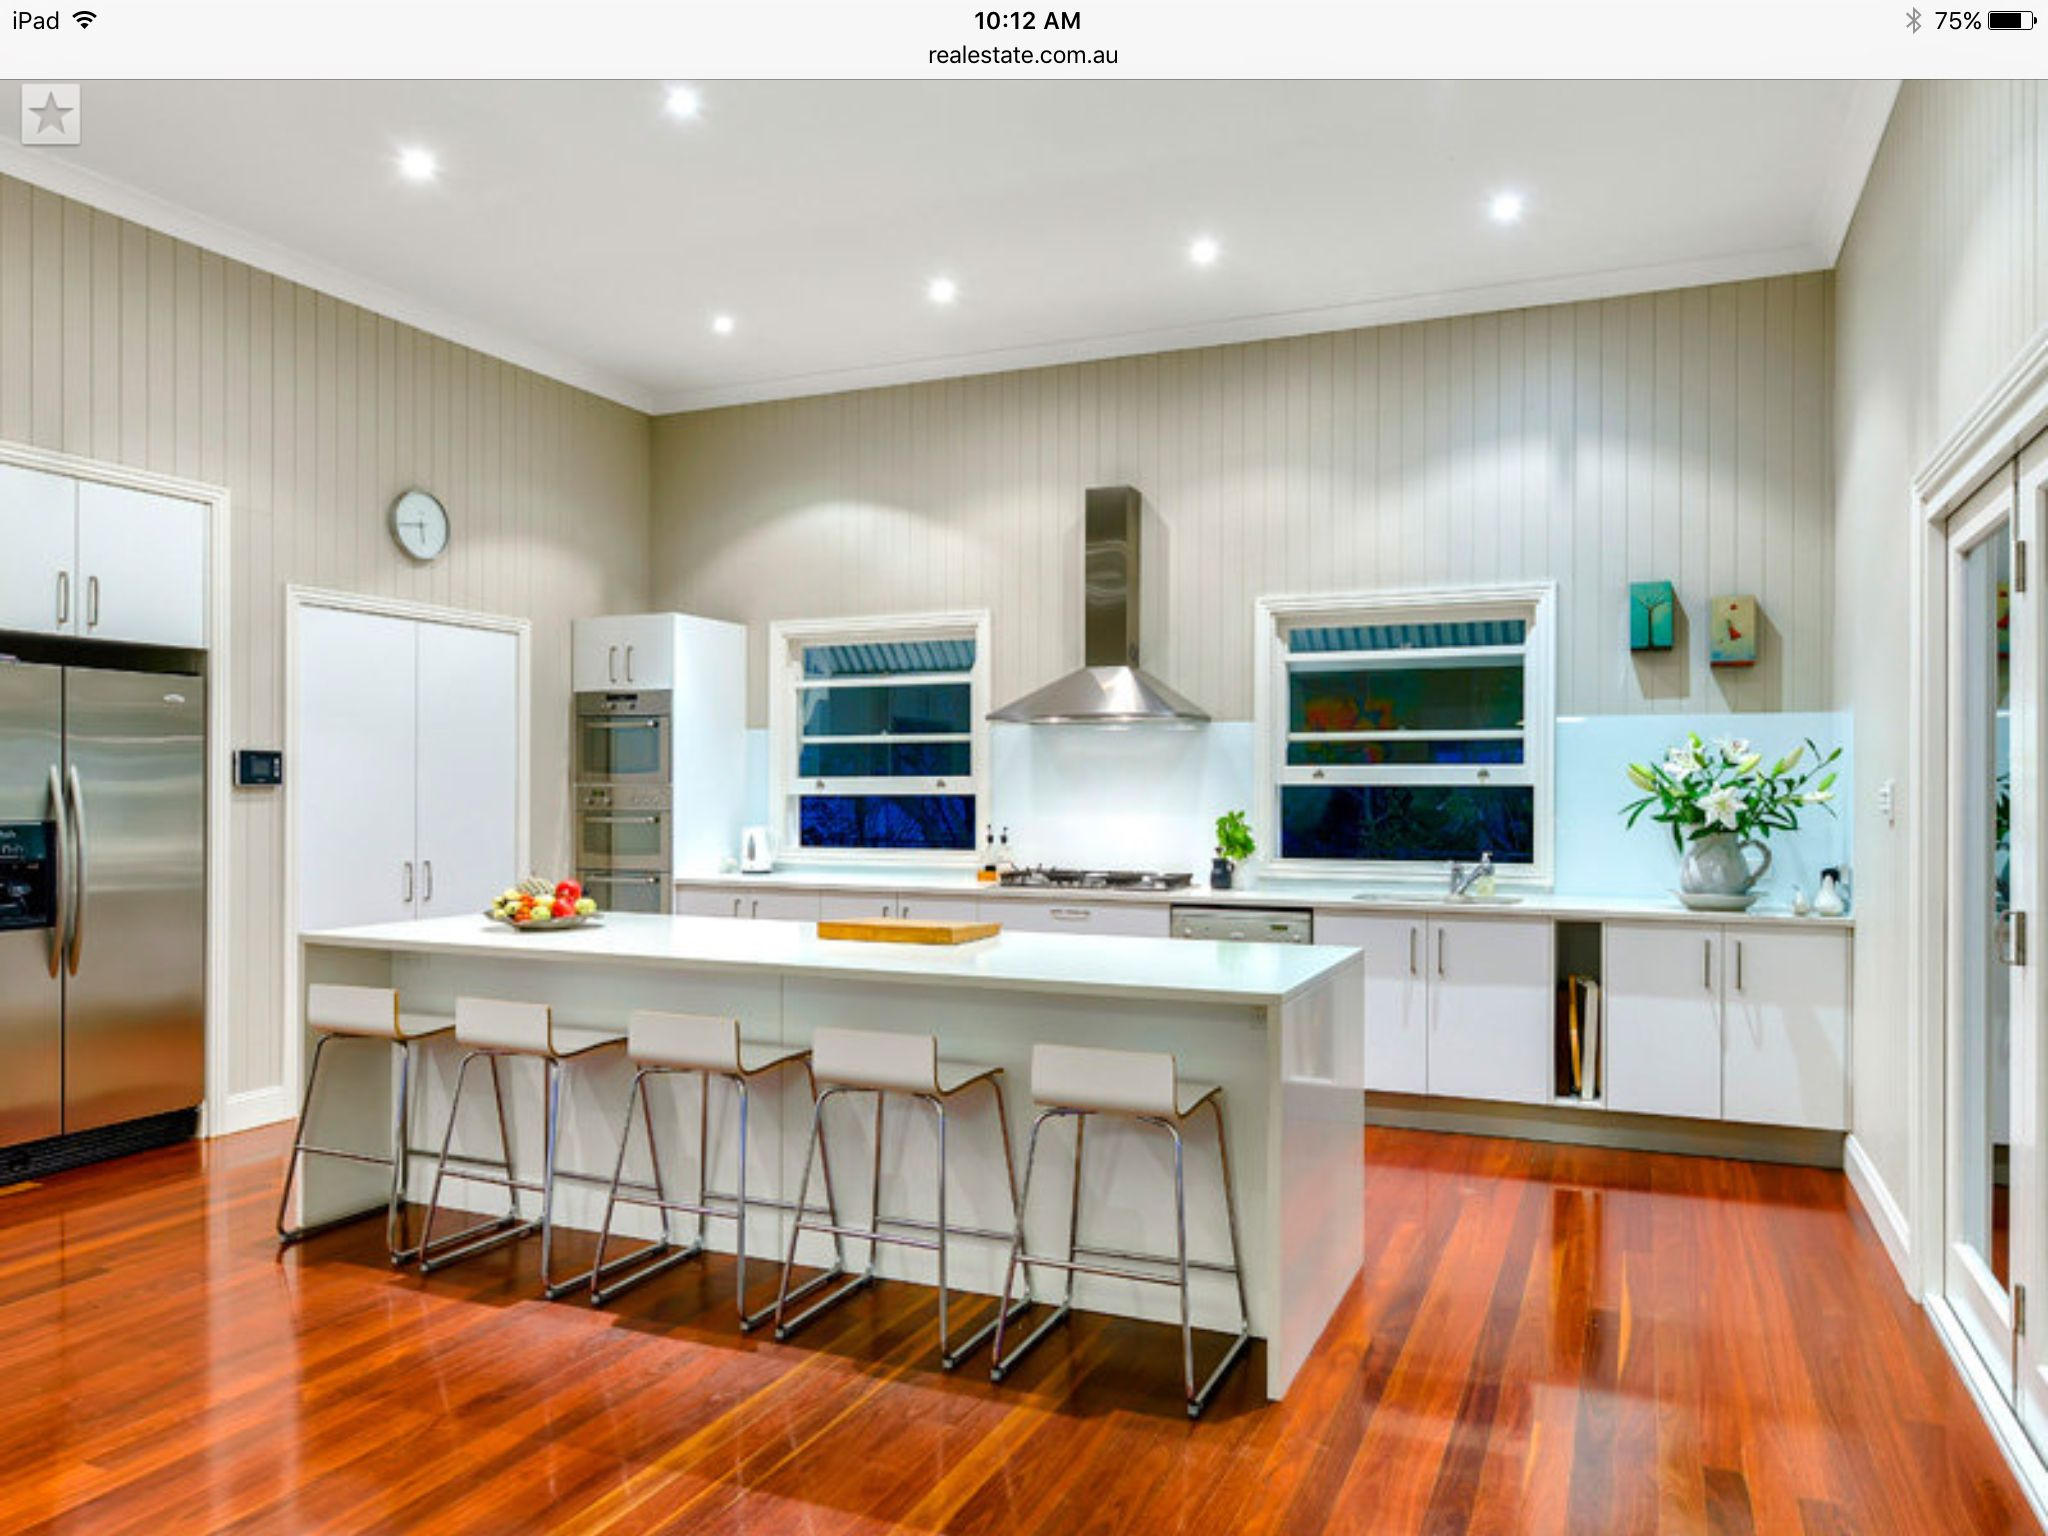 Pin de Anca Oaida en Kitchen | Pinterest